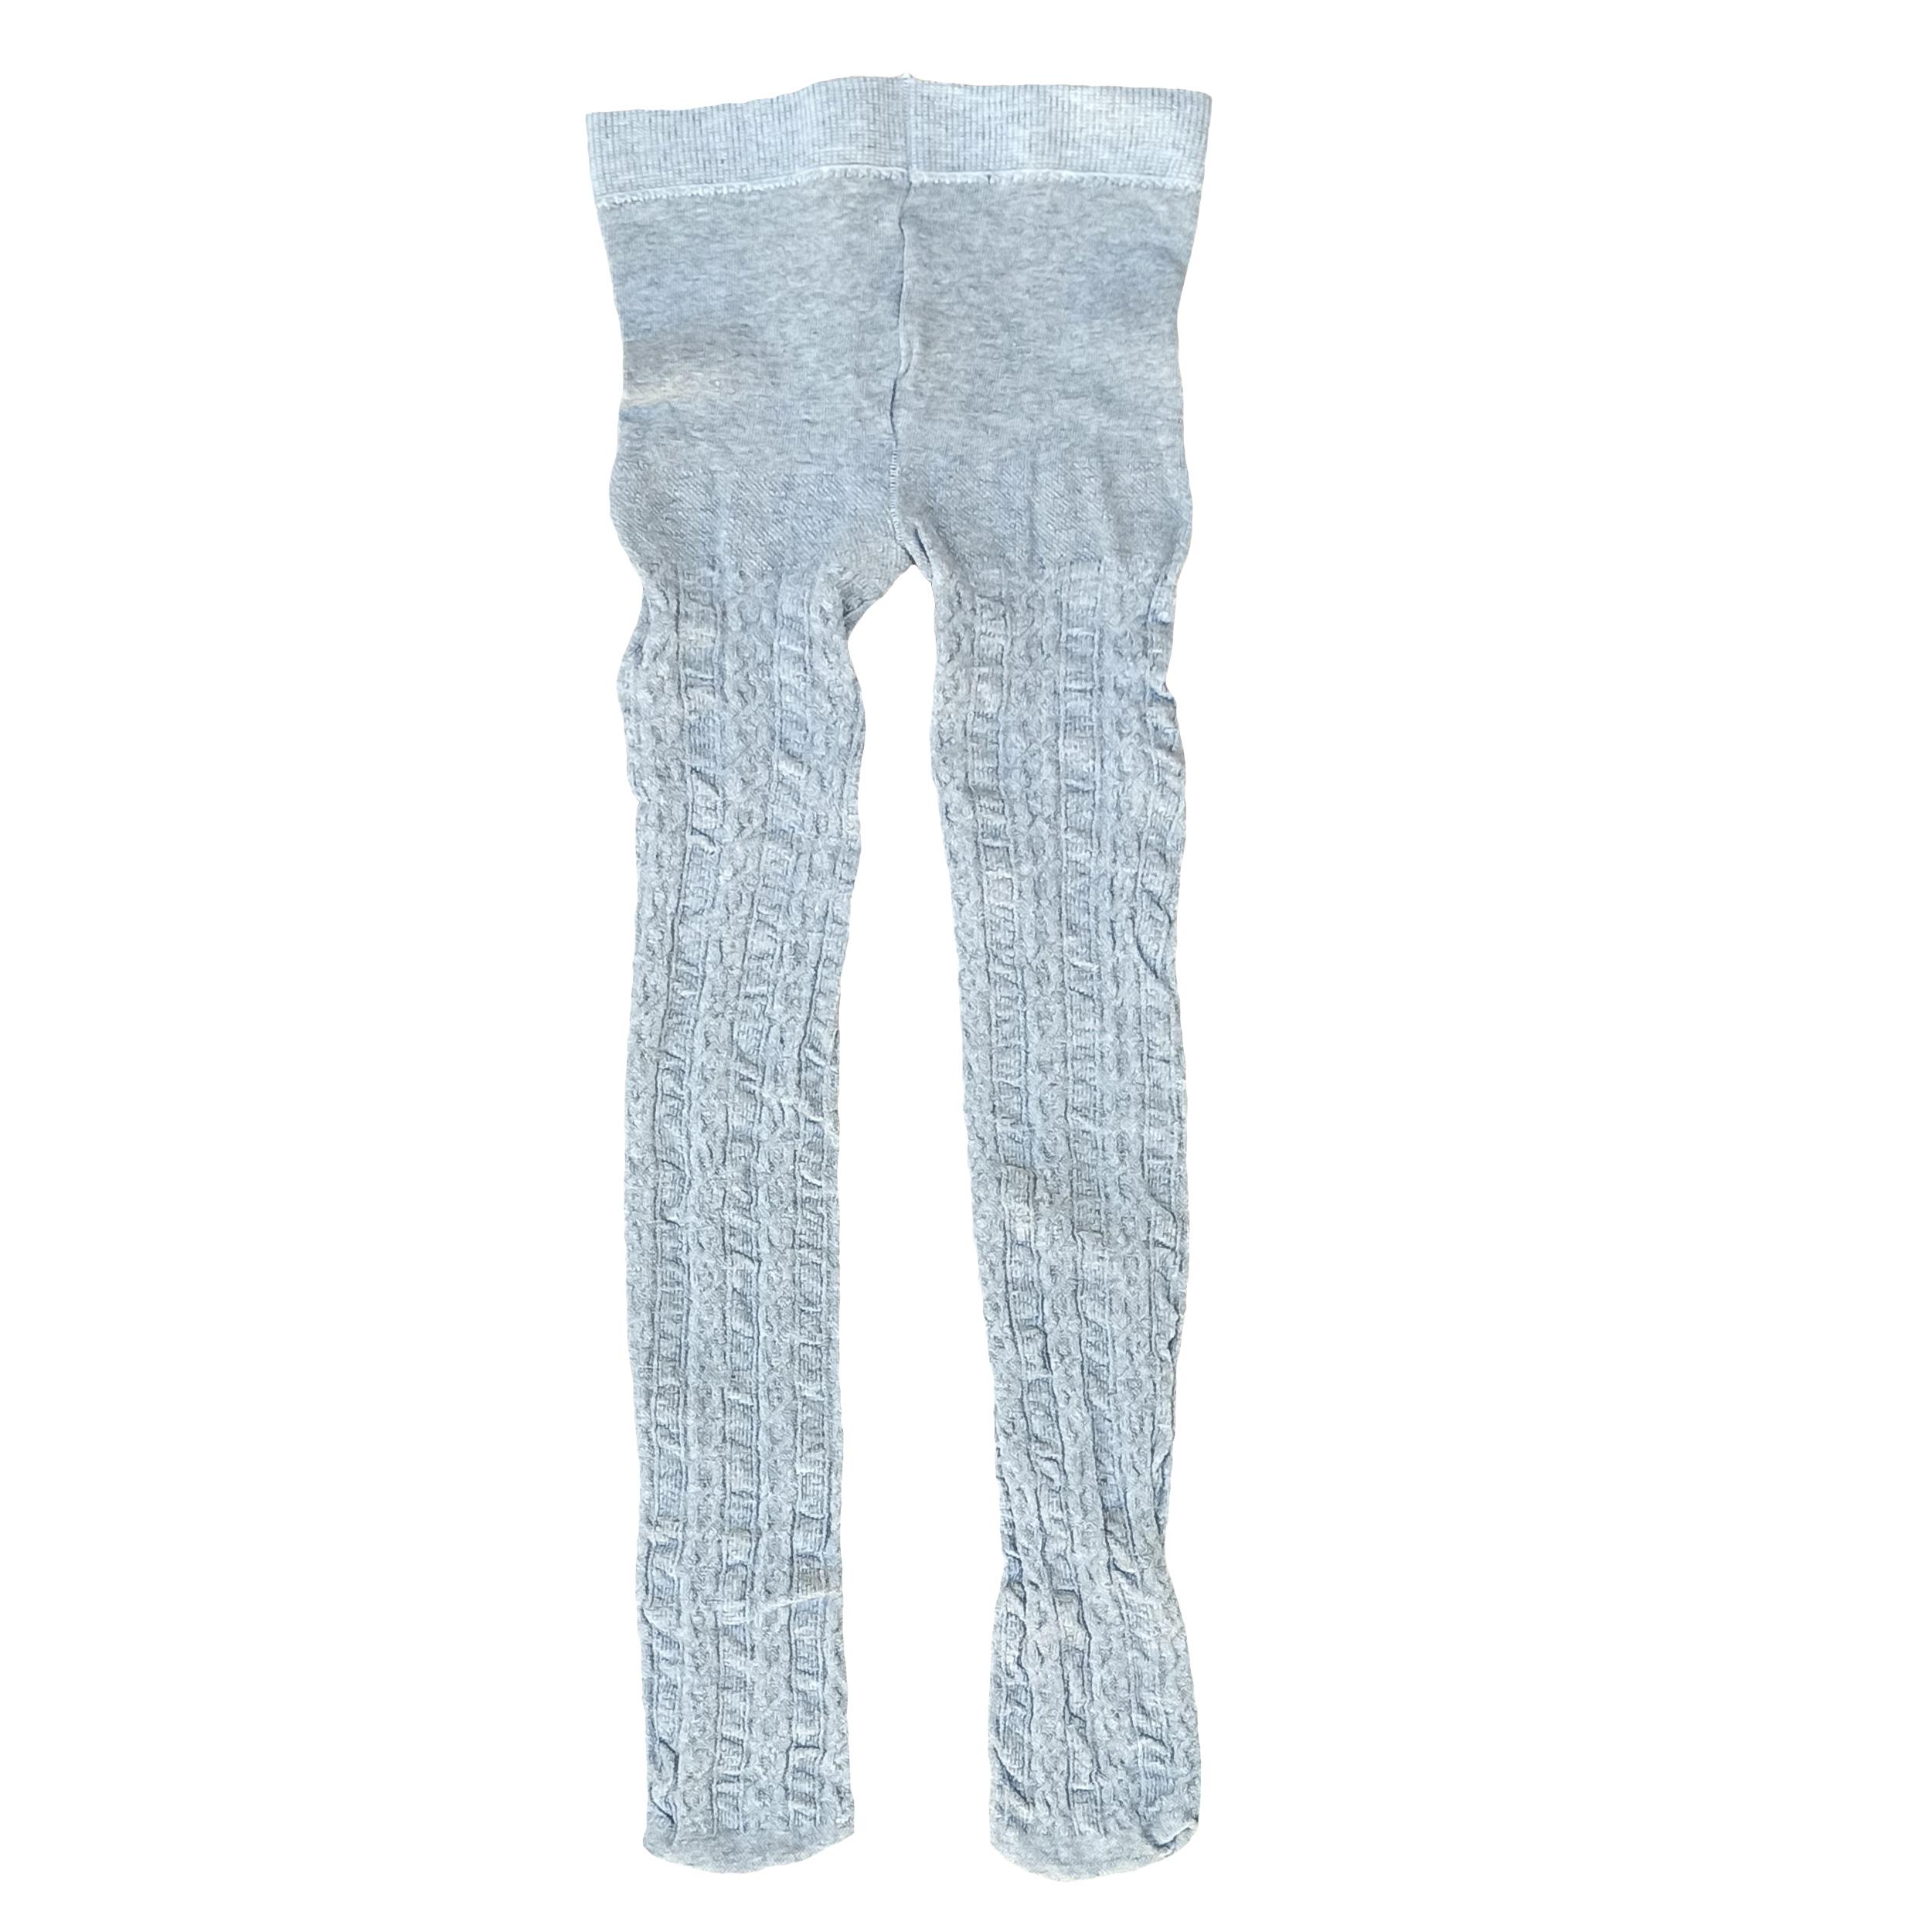 جوراب شلواری دخترانه پنتی مدل کارینا کد 070